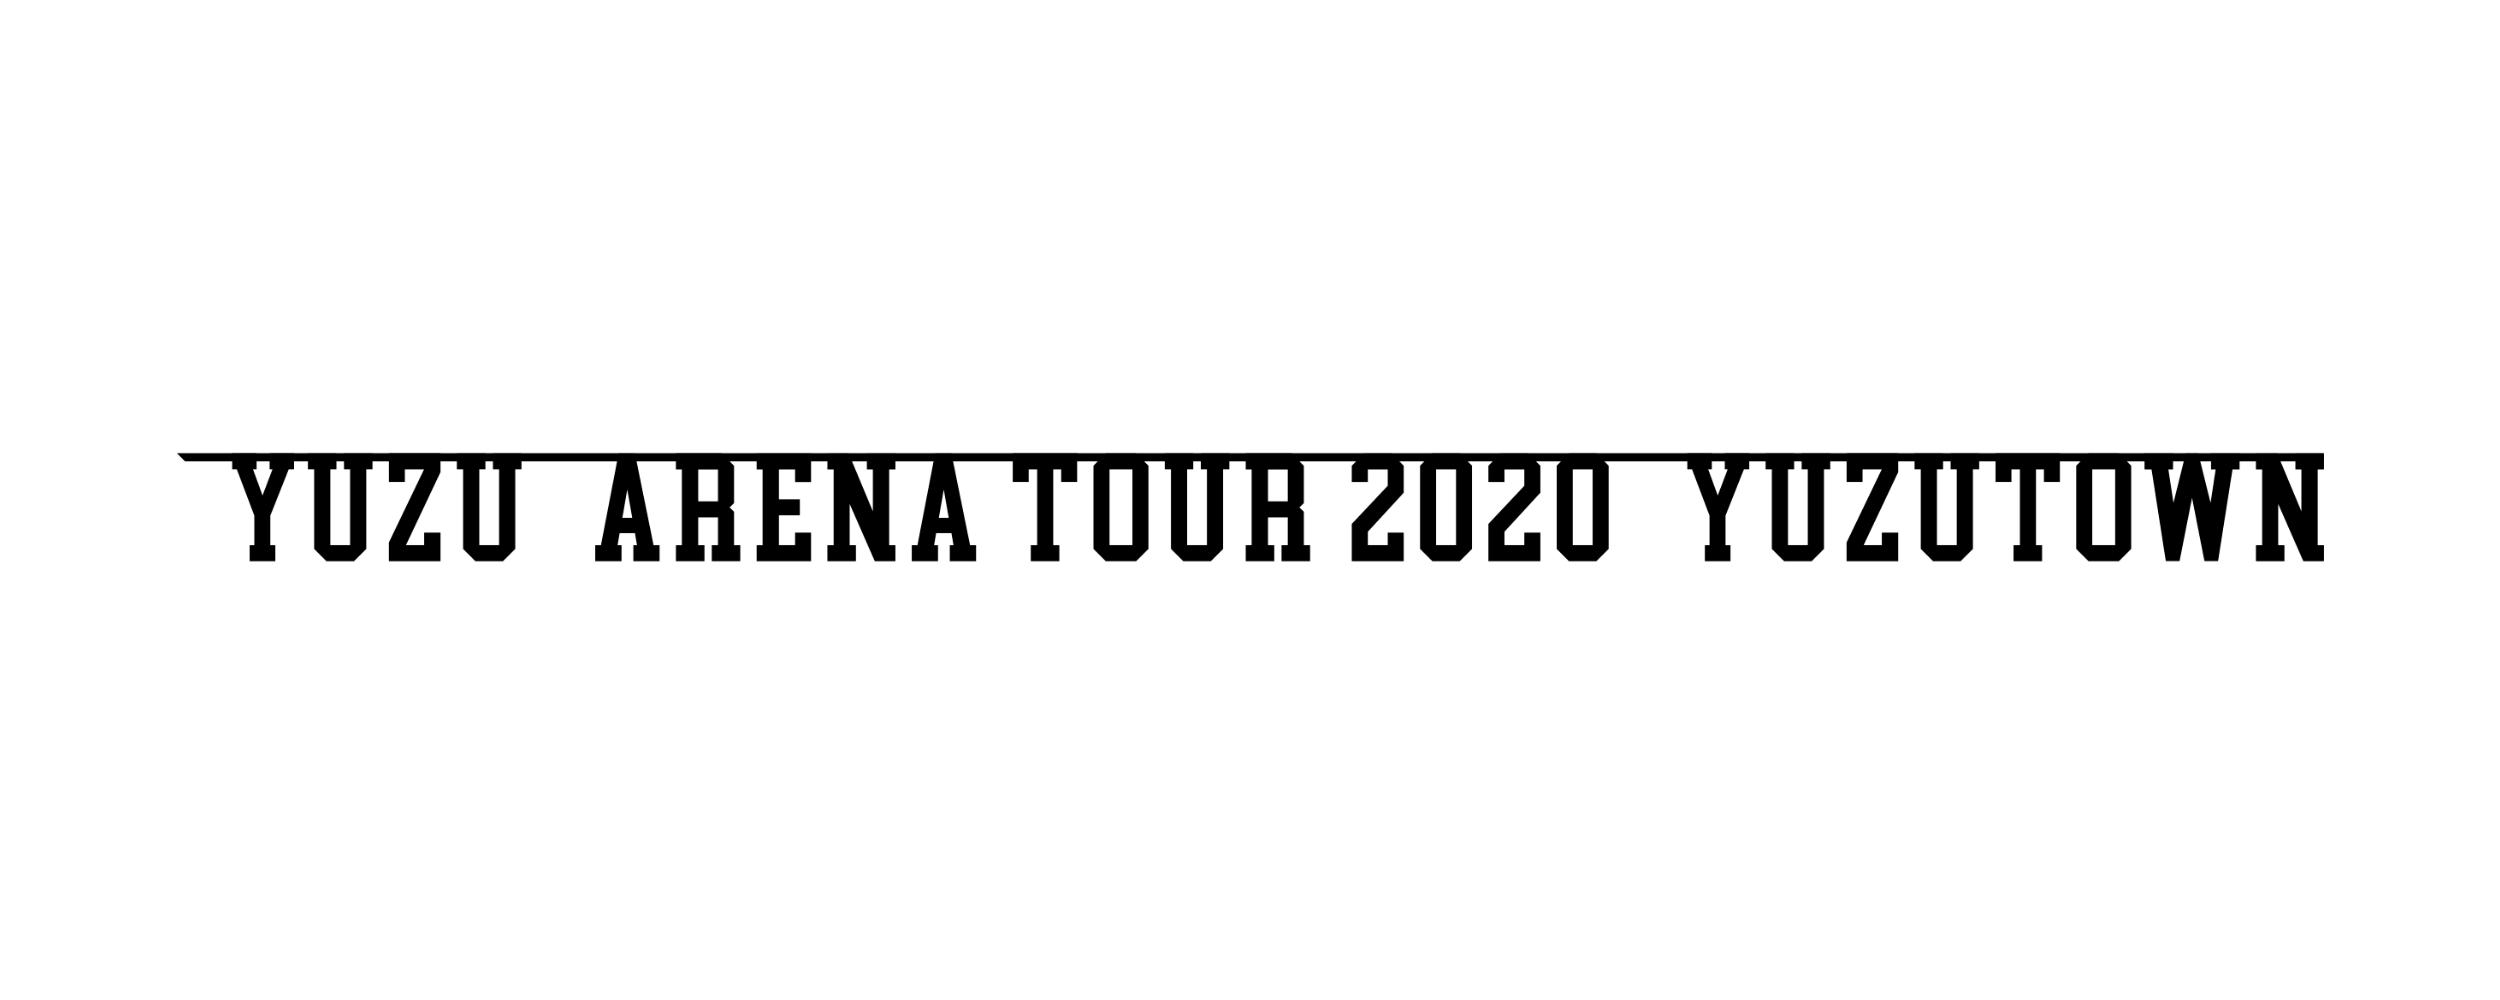 YUZU ARENA TOUR 2020 YUZUTOWN